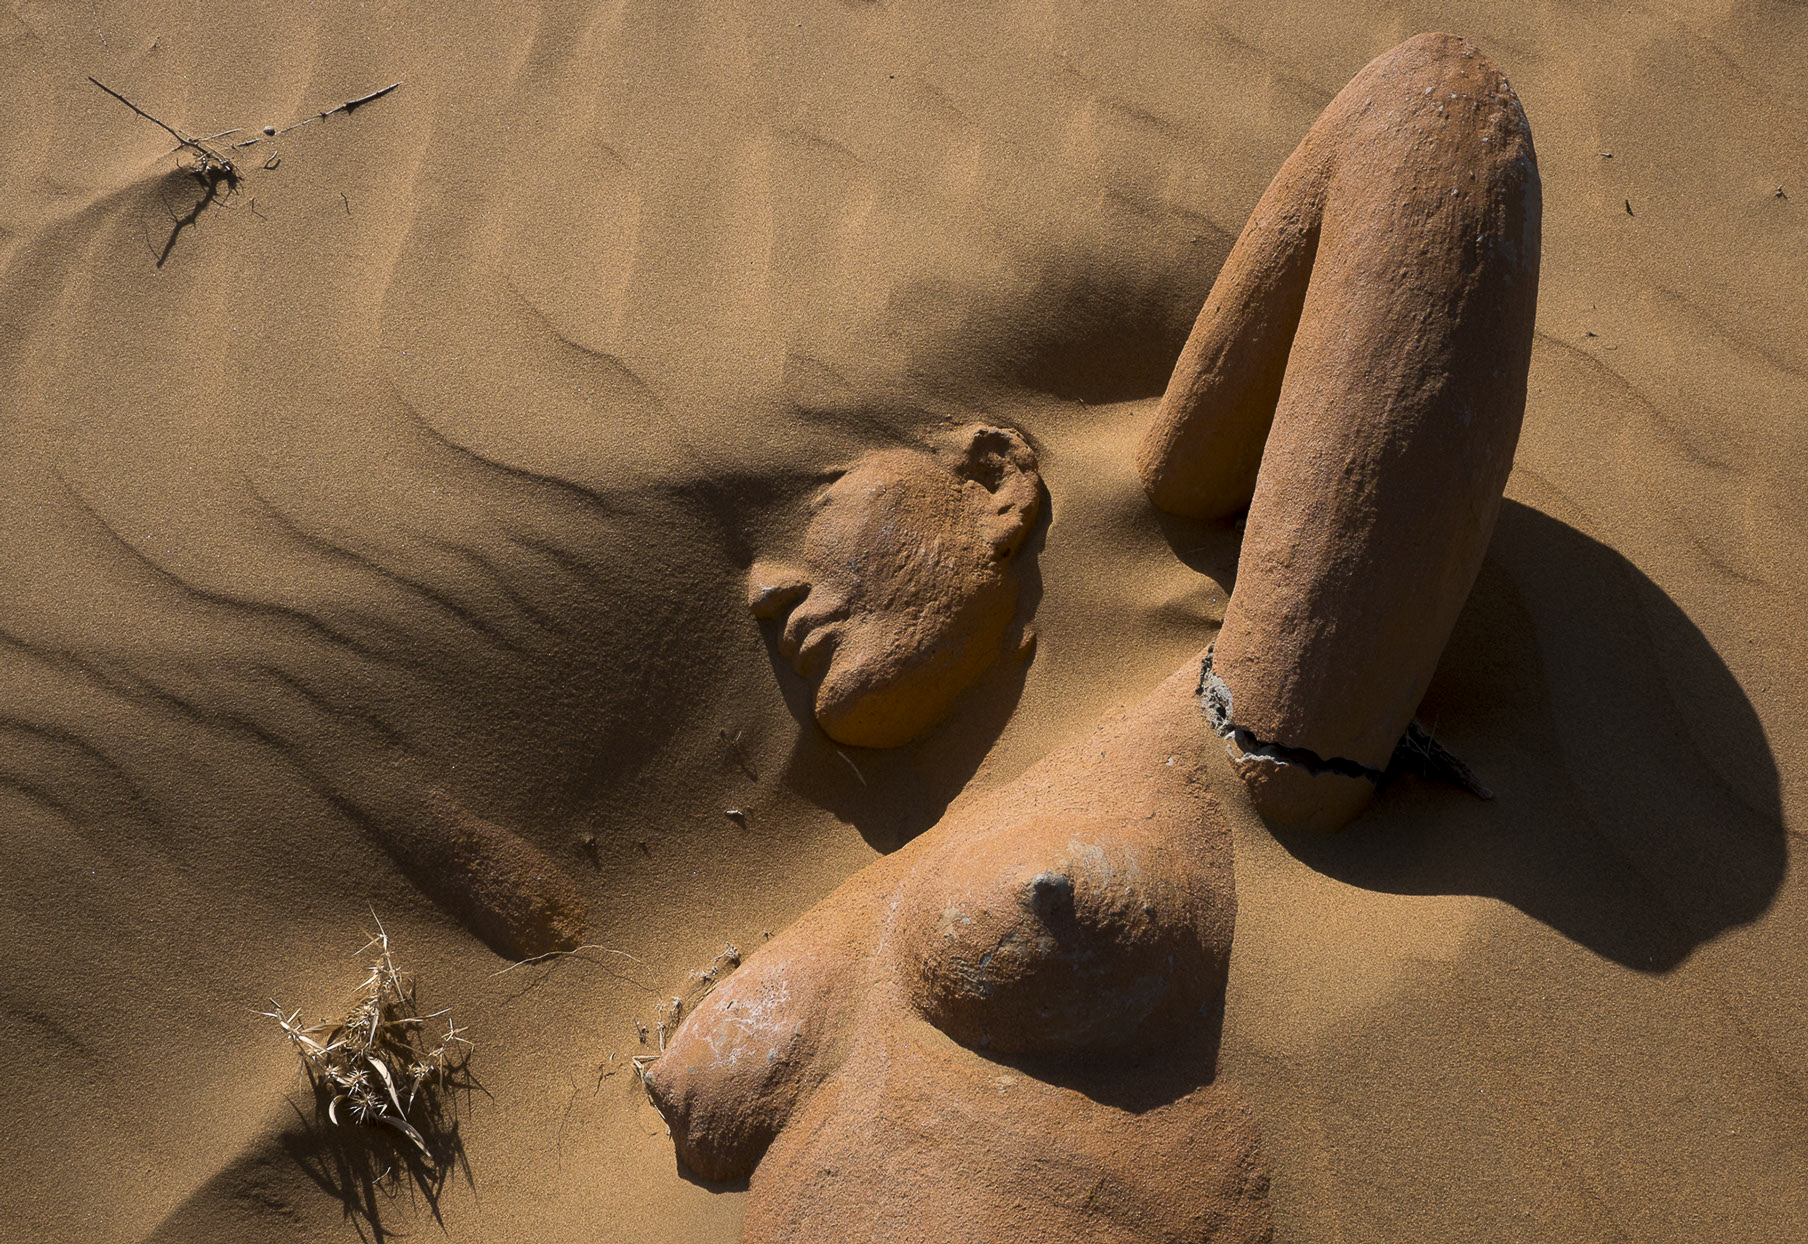 07-10977-The land of sand-03.jpg